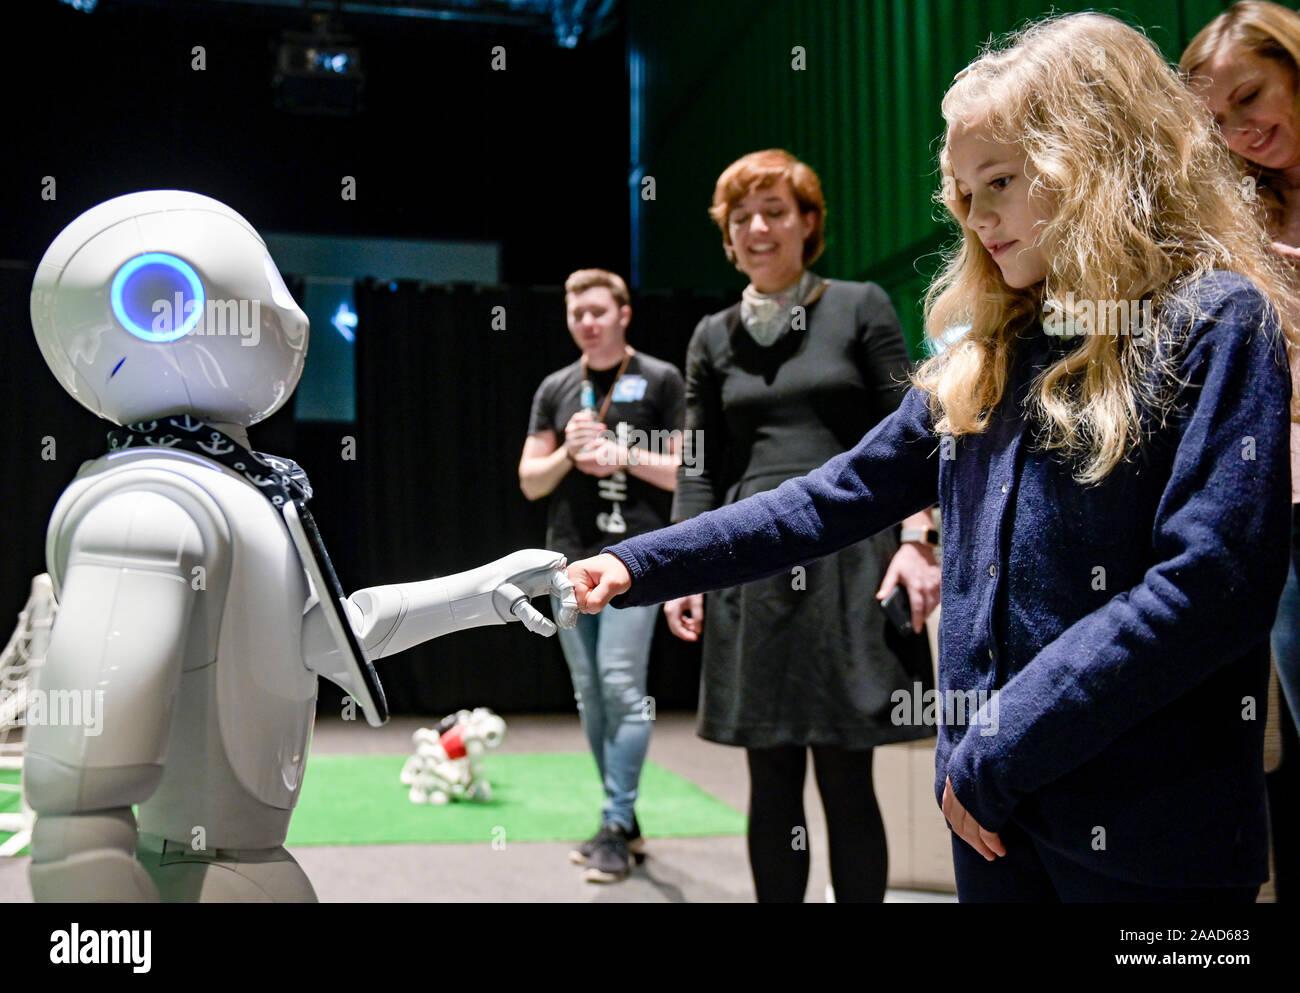 Robot dating